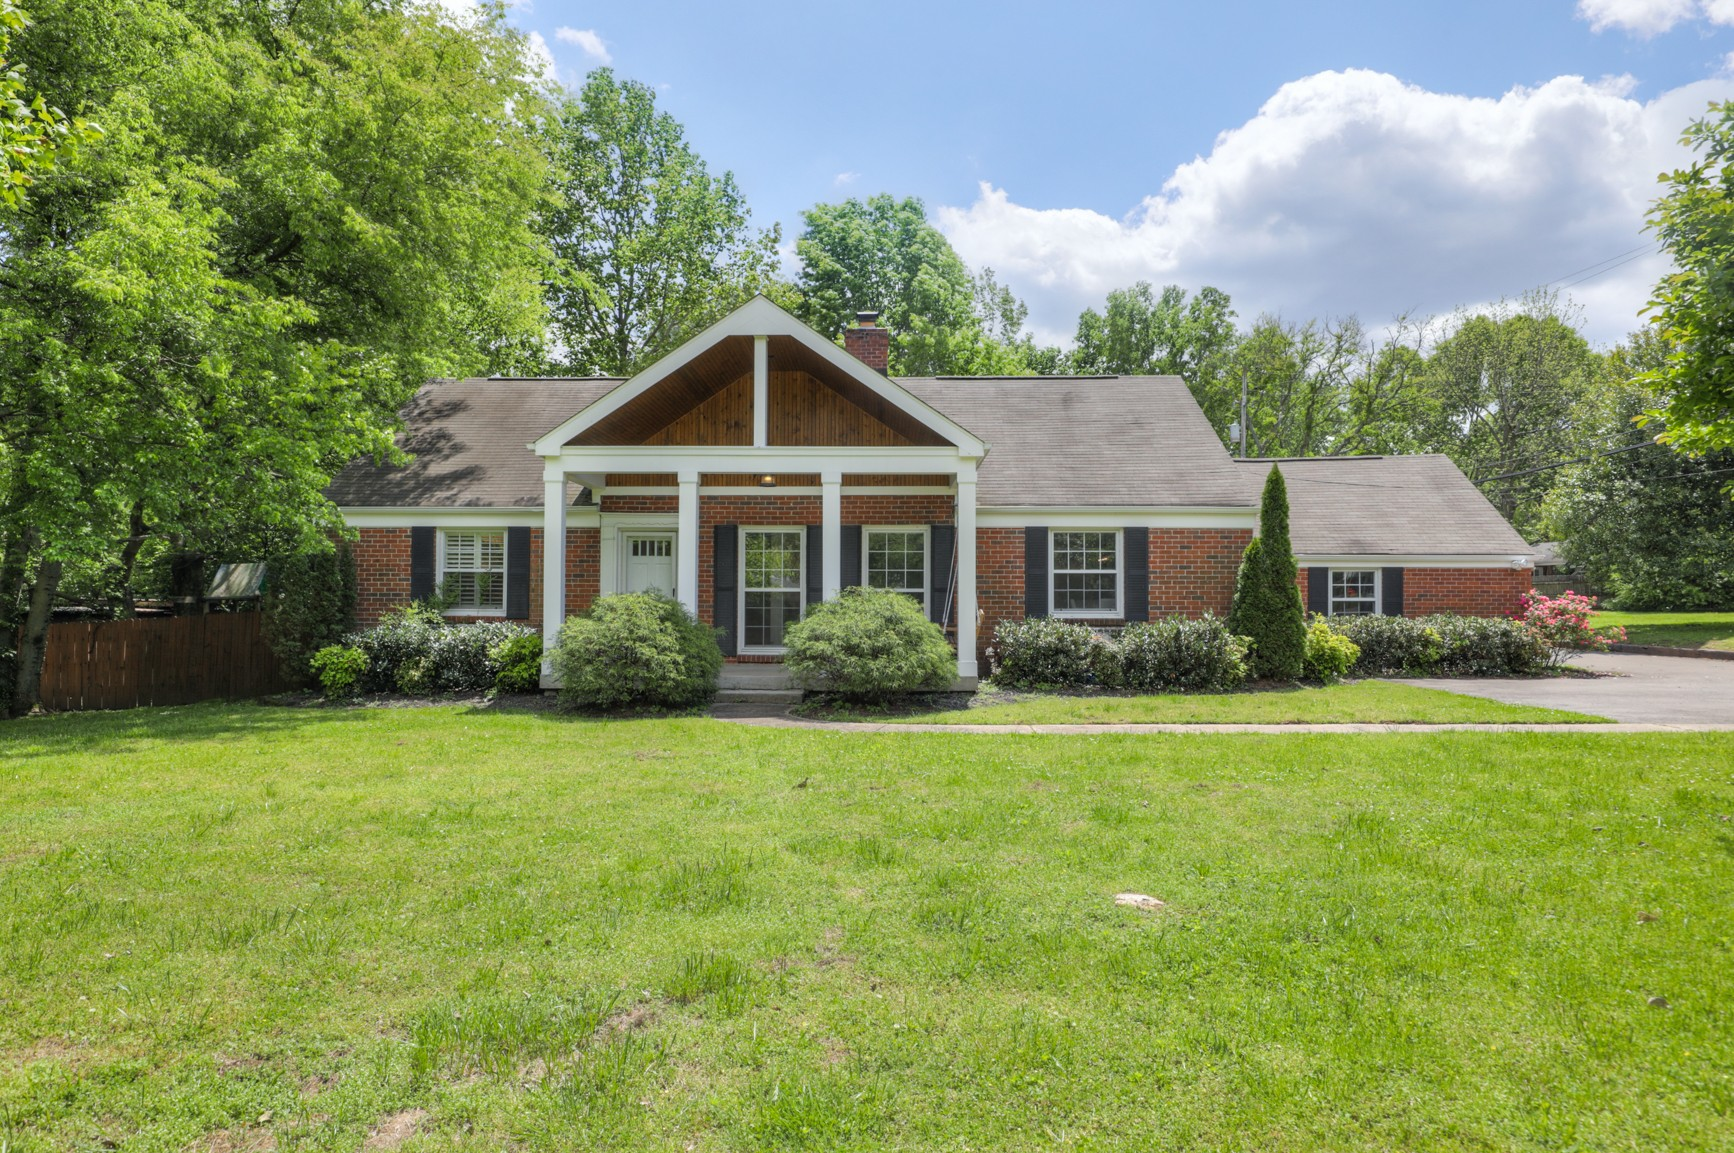 833 Woodmont Blvd Property Photo - Nashville, TN real estate listing